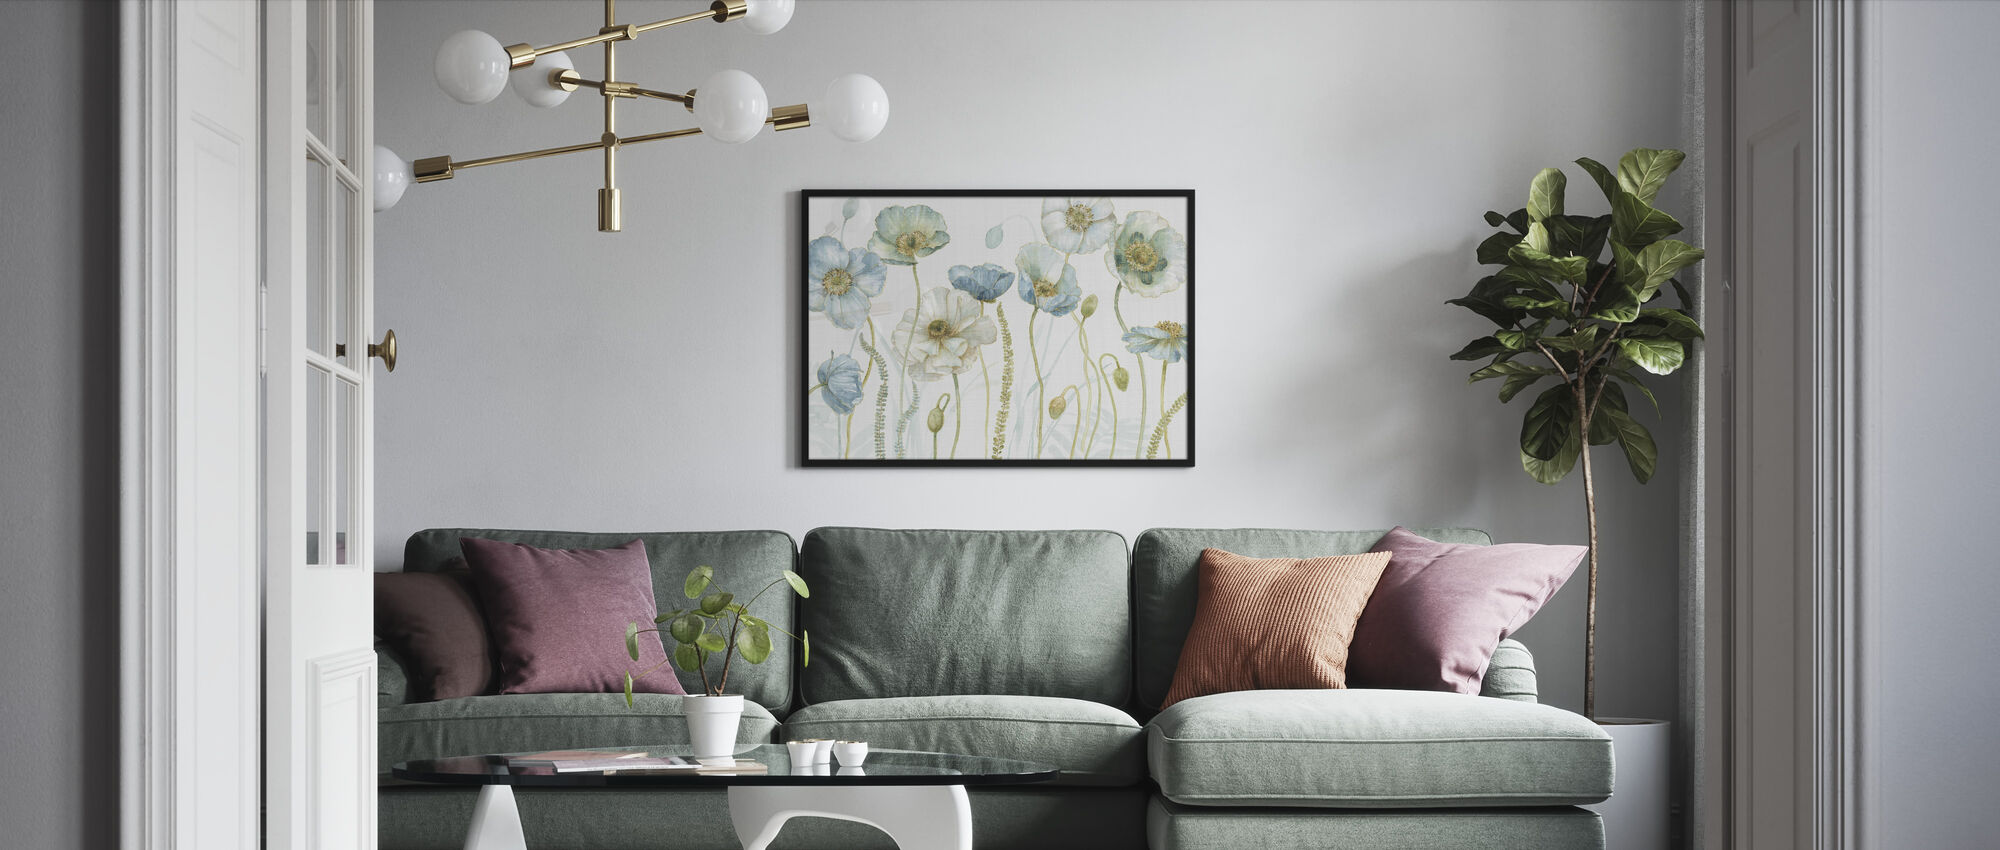 My Greenhouse Flowers on Linen - Framed print - Living Room